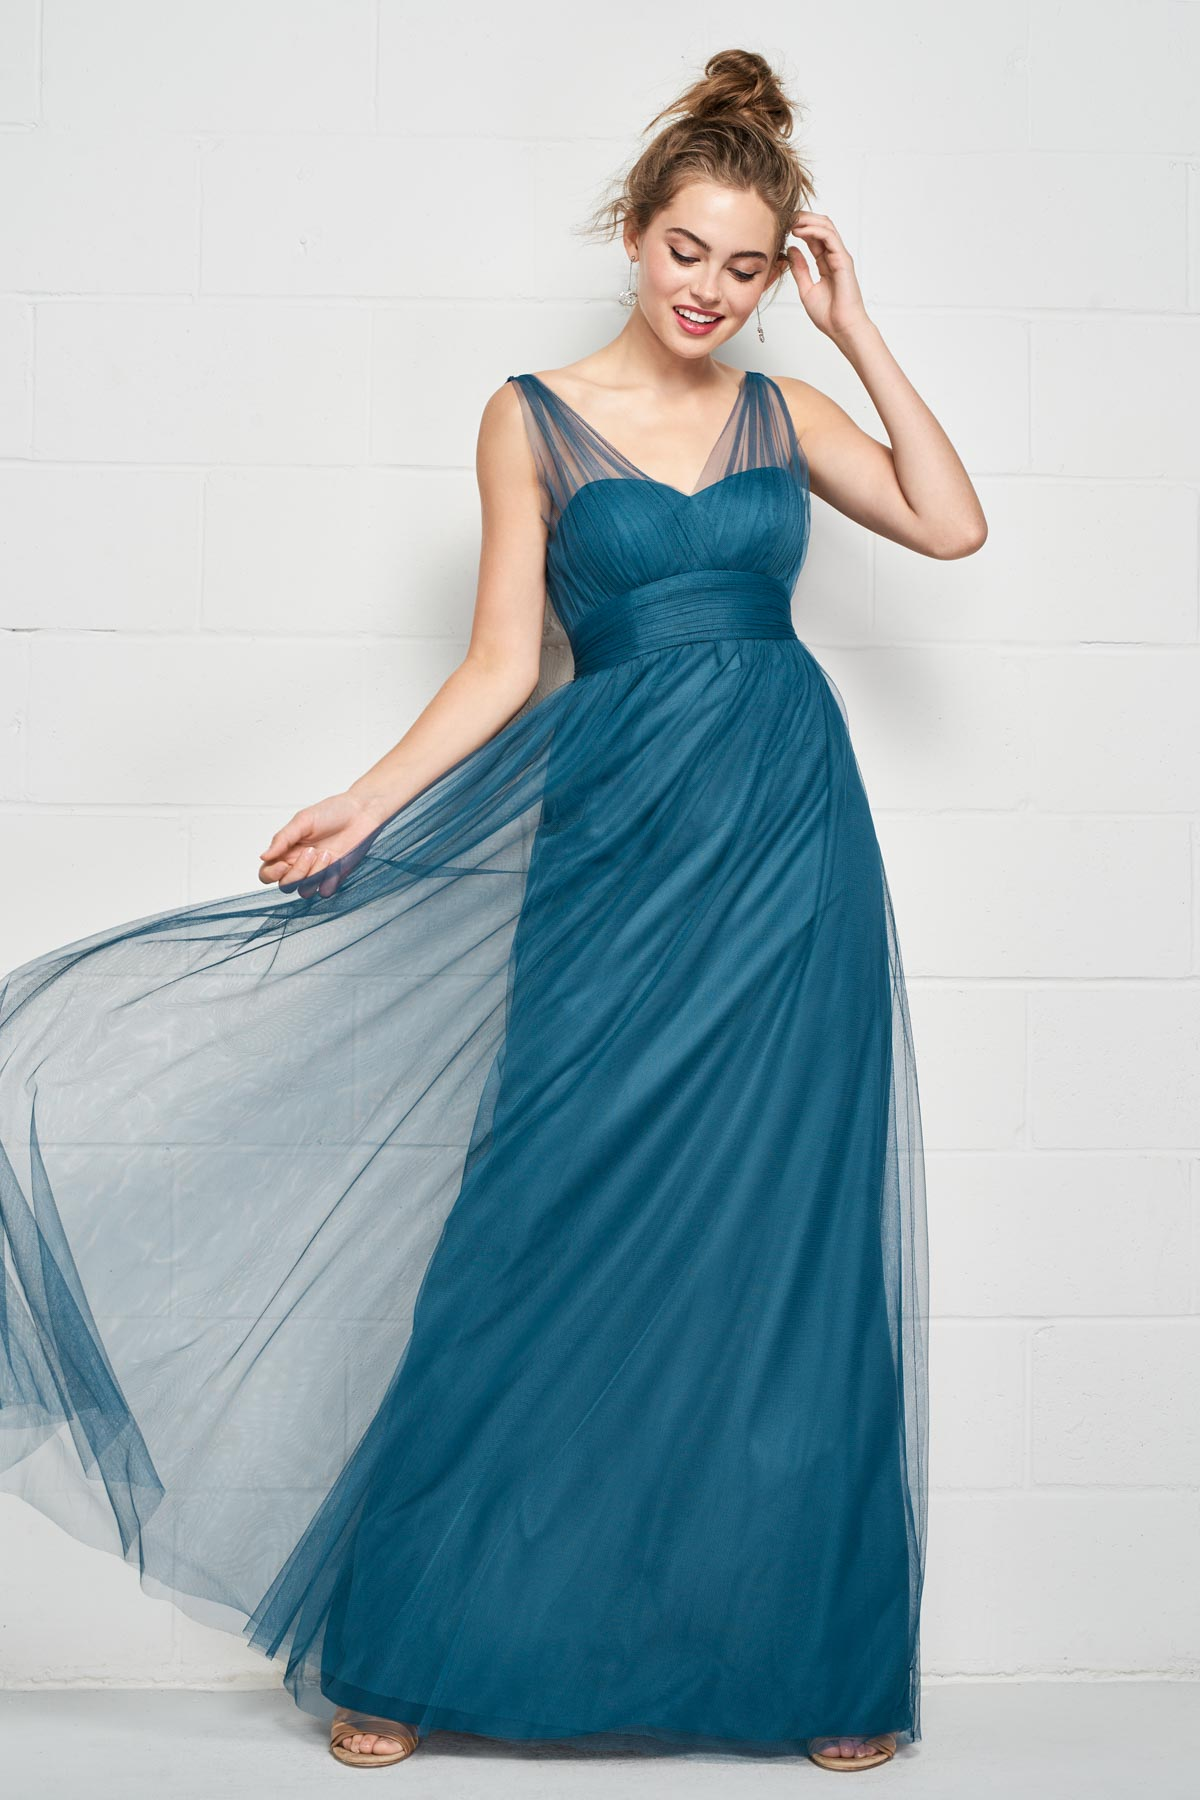 Wtoo Bridesmaid Dresses - Lori G Bridal